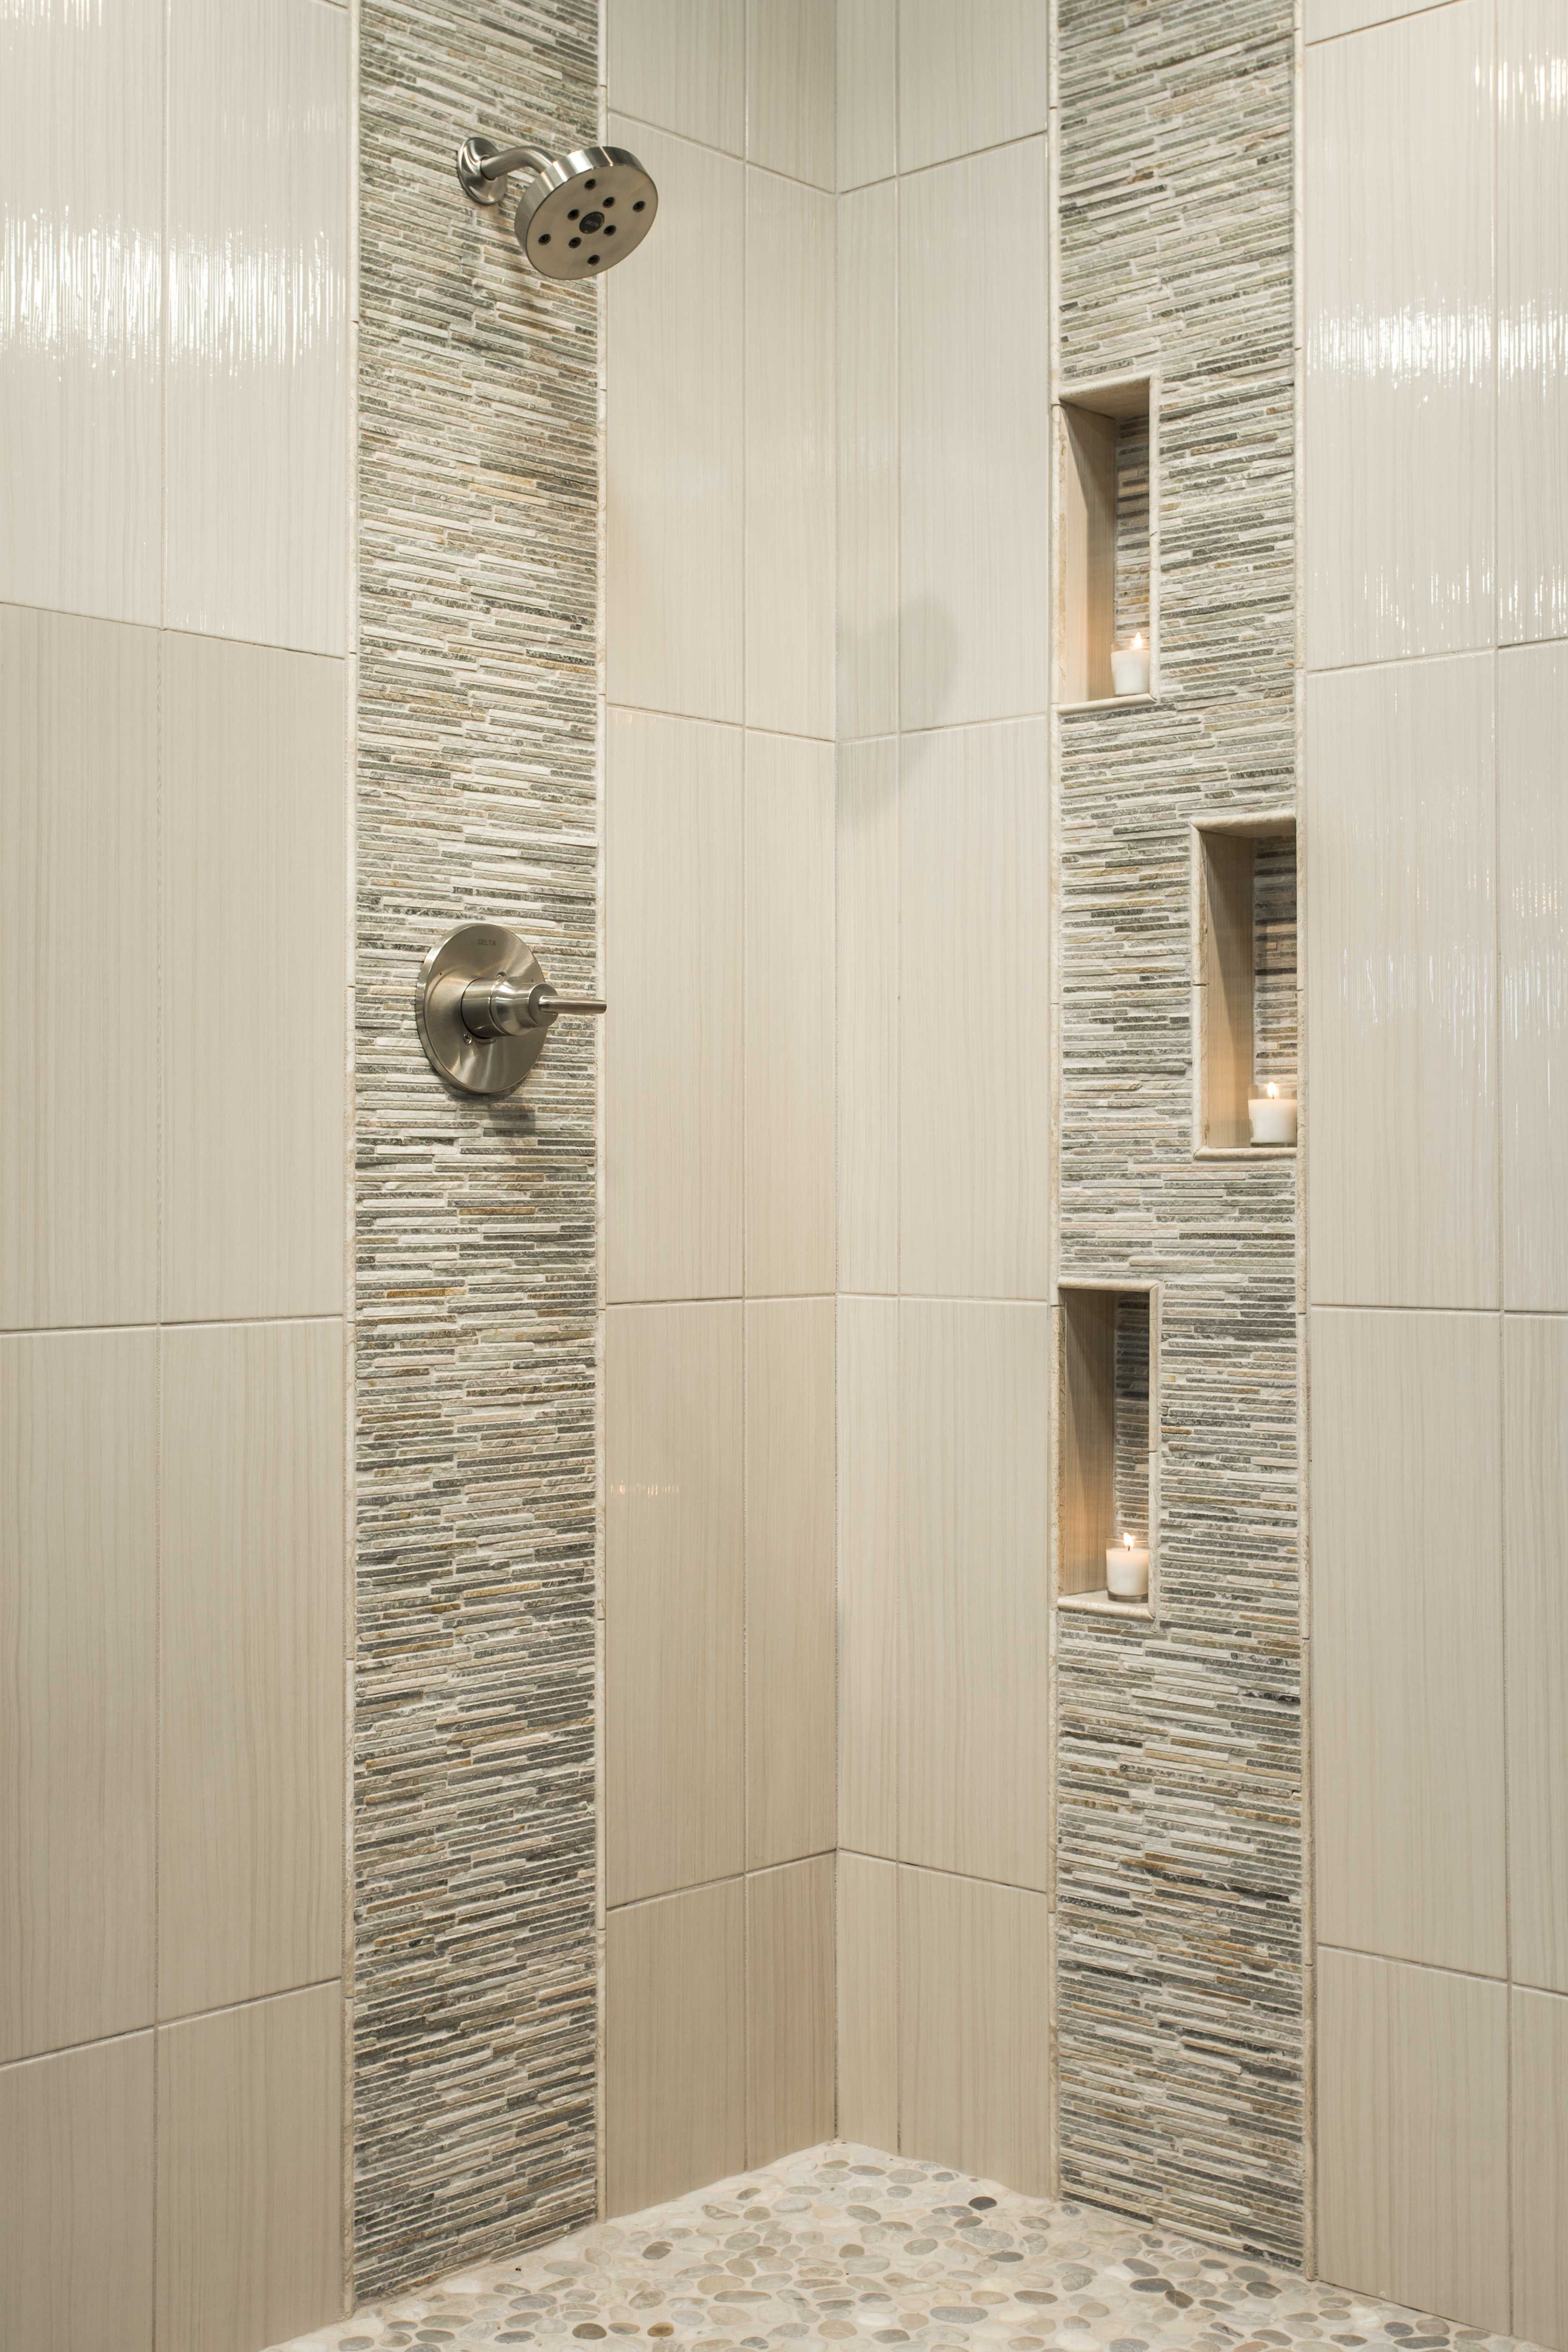 31 Bathroom Tile Ideas Make It Fresh And Not Boring Bathroom